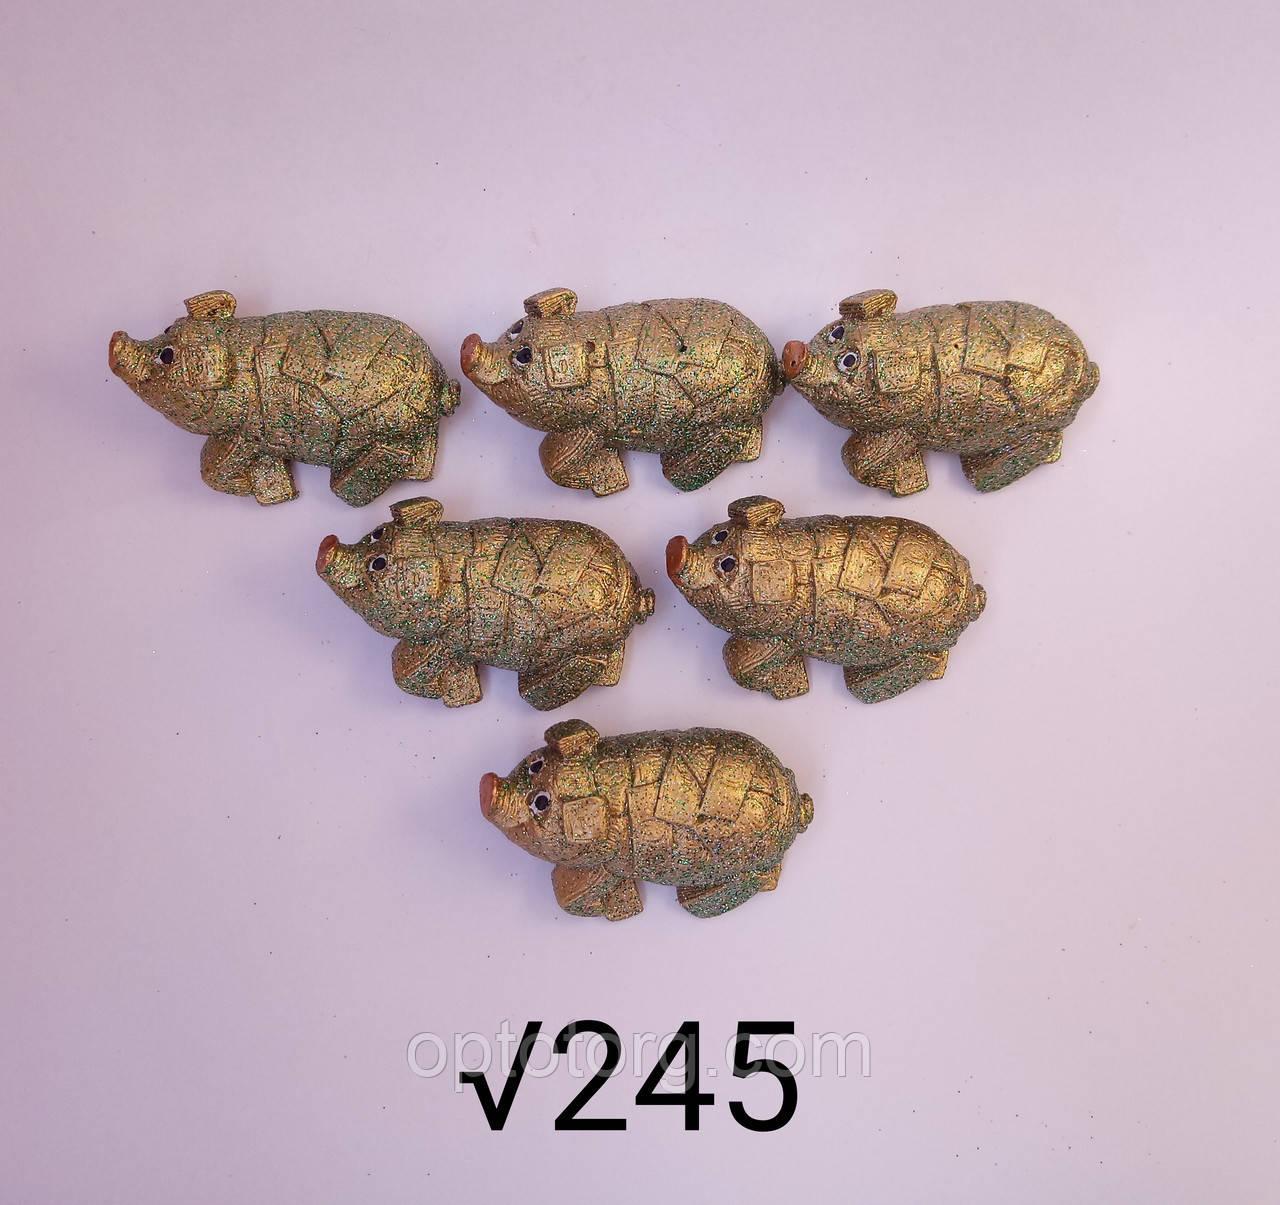 Статуэтки набор 6 шт Год Свиньи 2019 размер 5*3 см